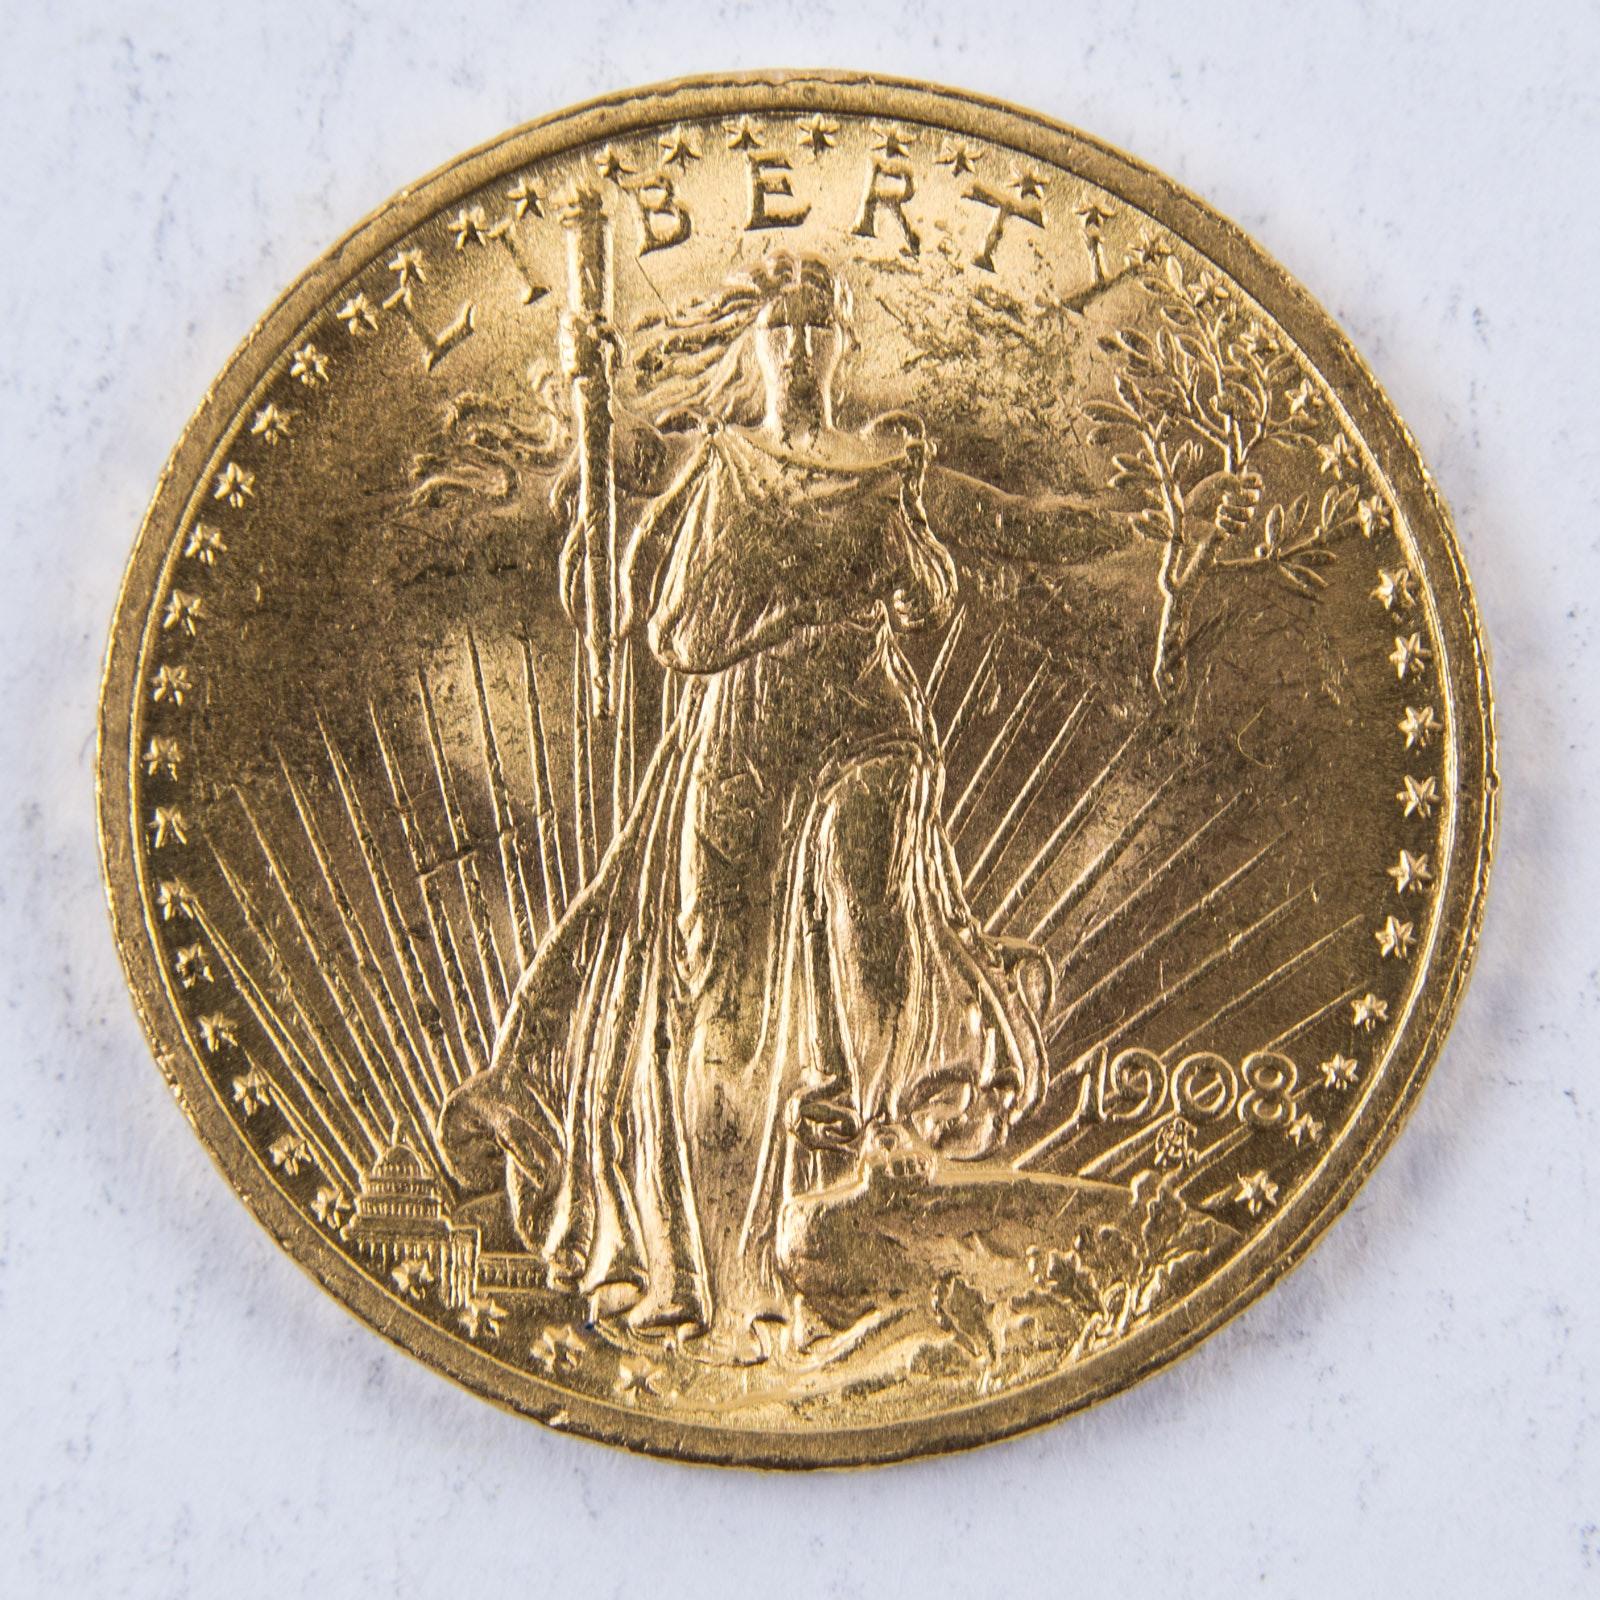 1908 St. Gaudens No Motto Twenty Dollar Gold Coin